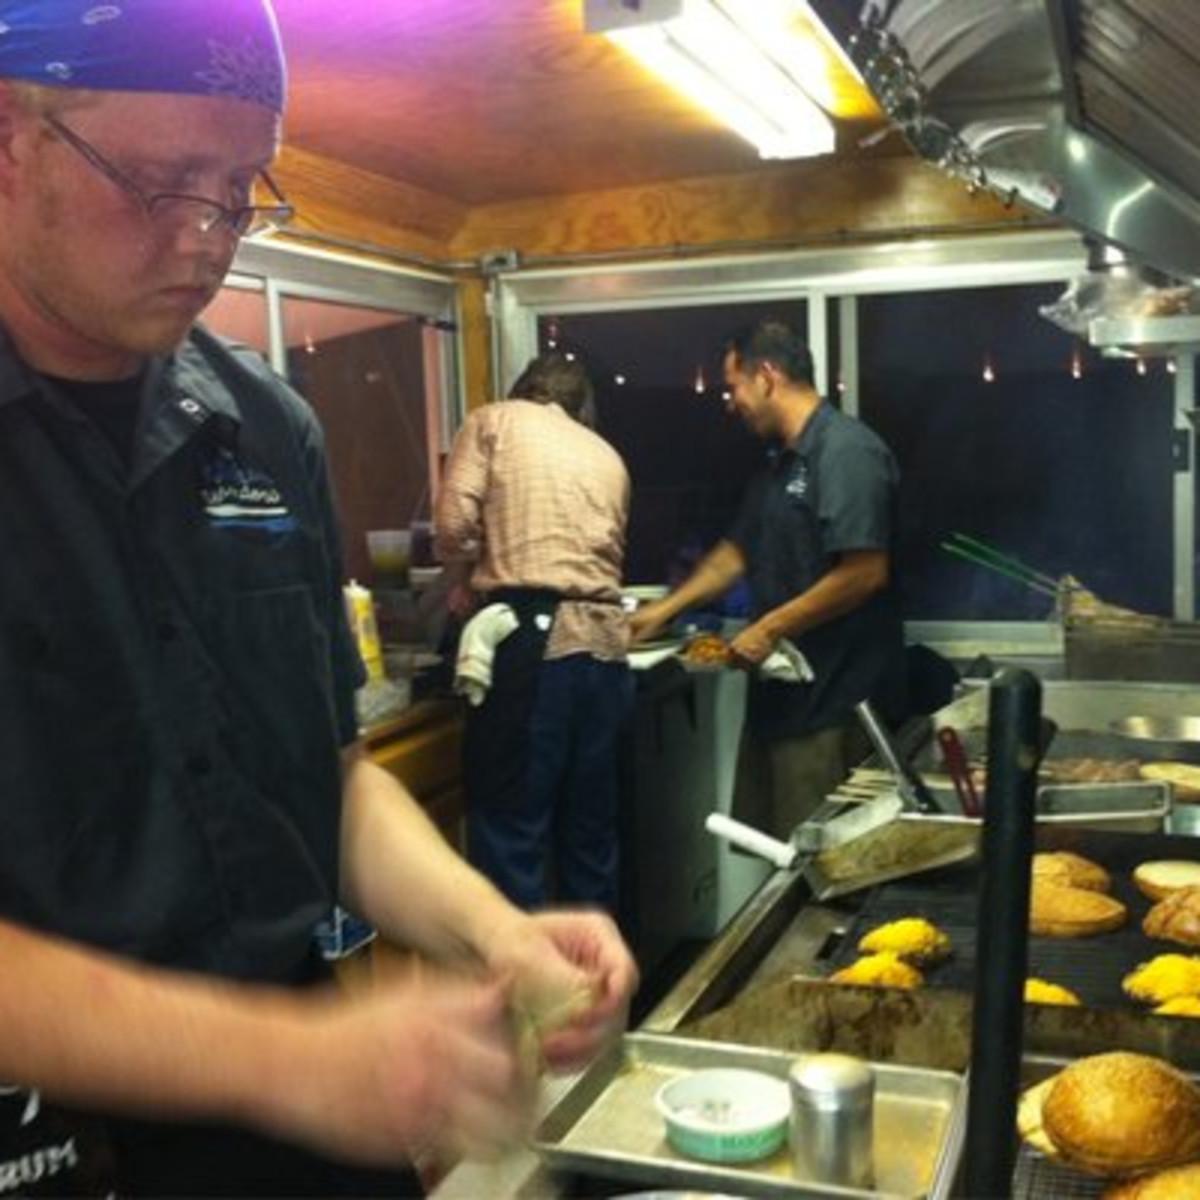 Austin Photo: Places_Food_the_kitchen_window_preparation